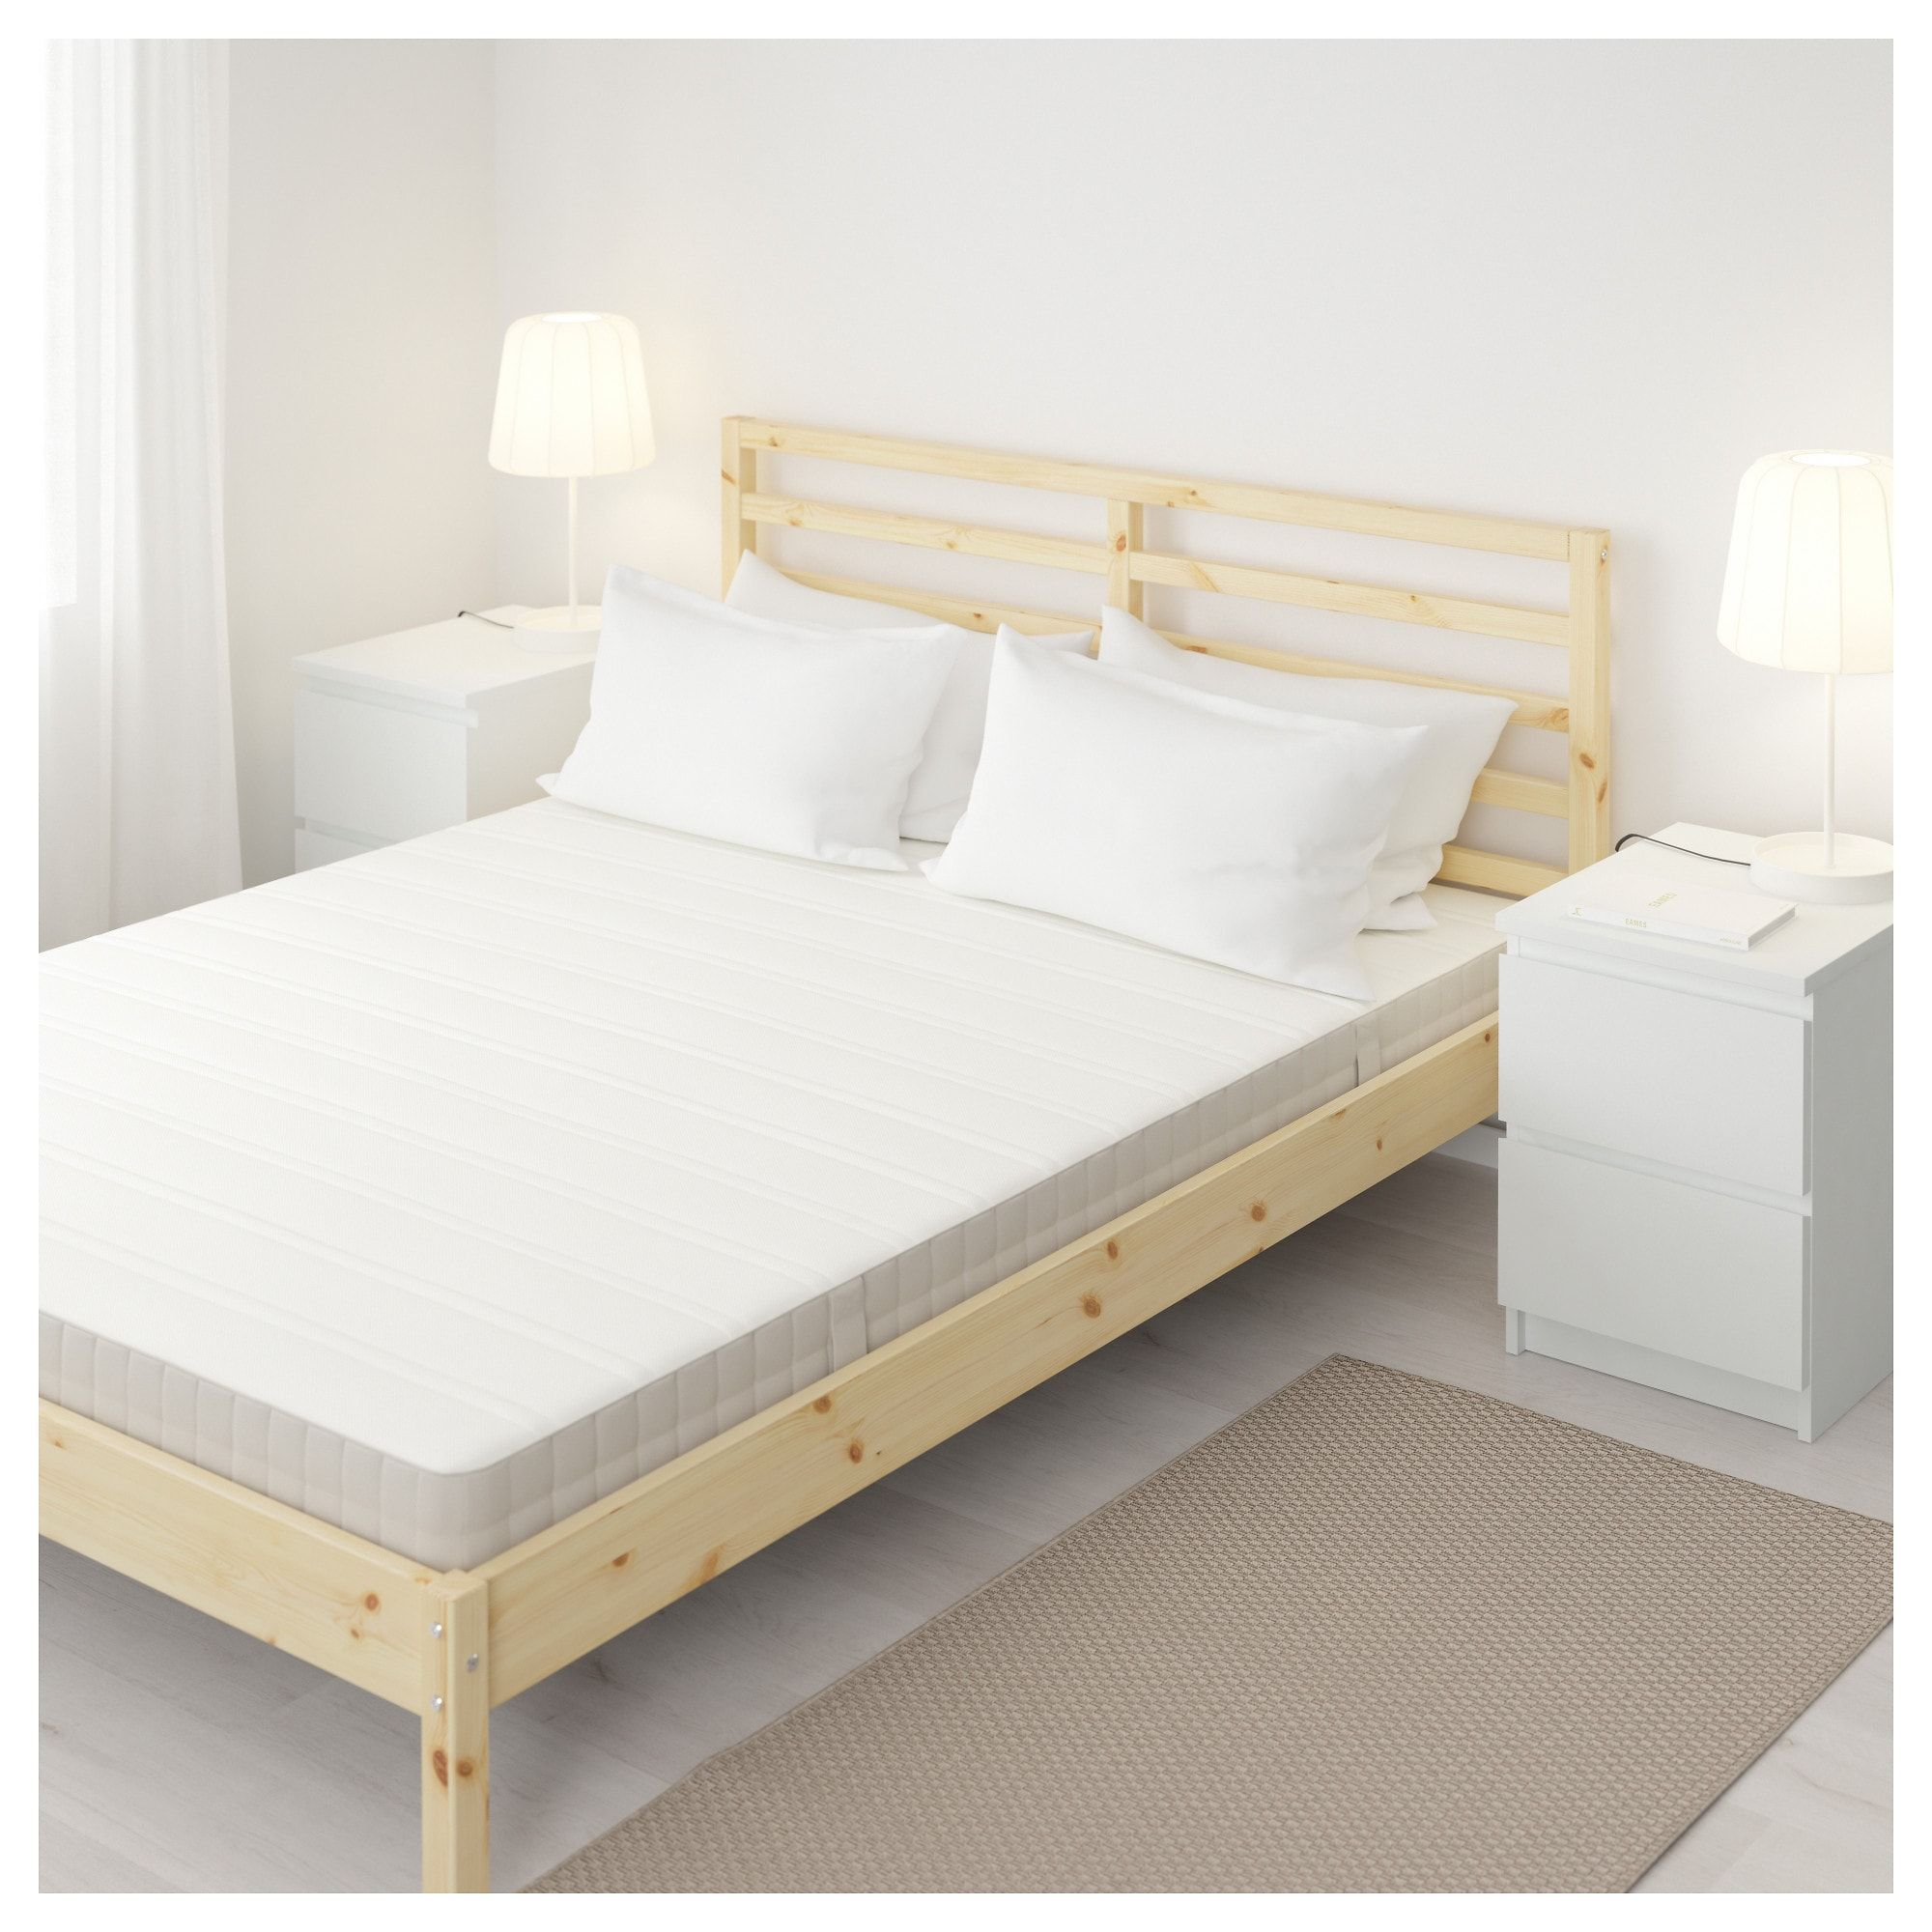 IKEA HASVAG Medium Firm, Beige Spring mattress Mattress